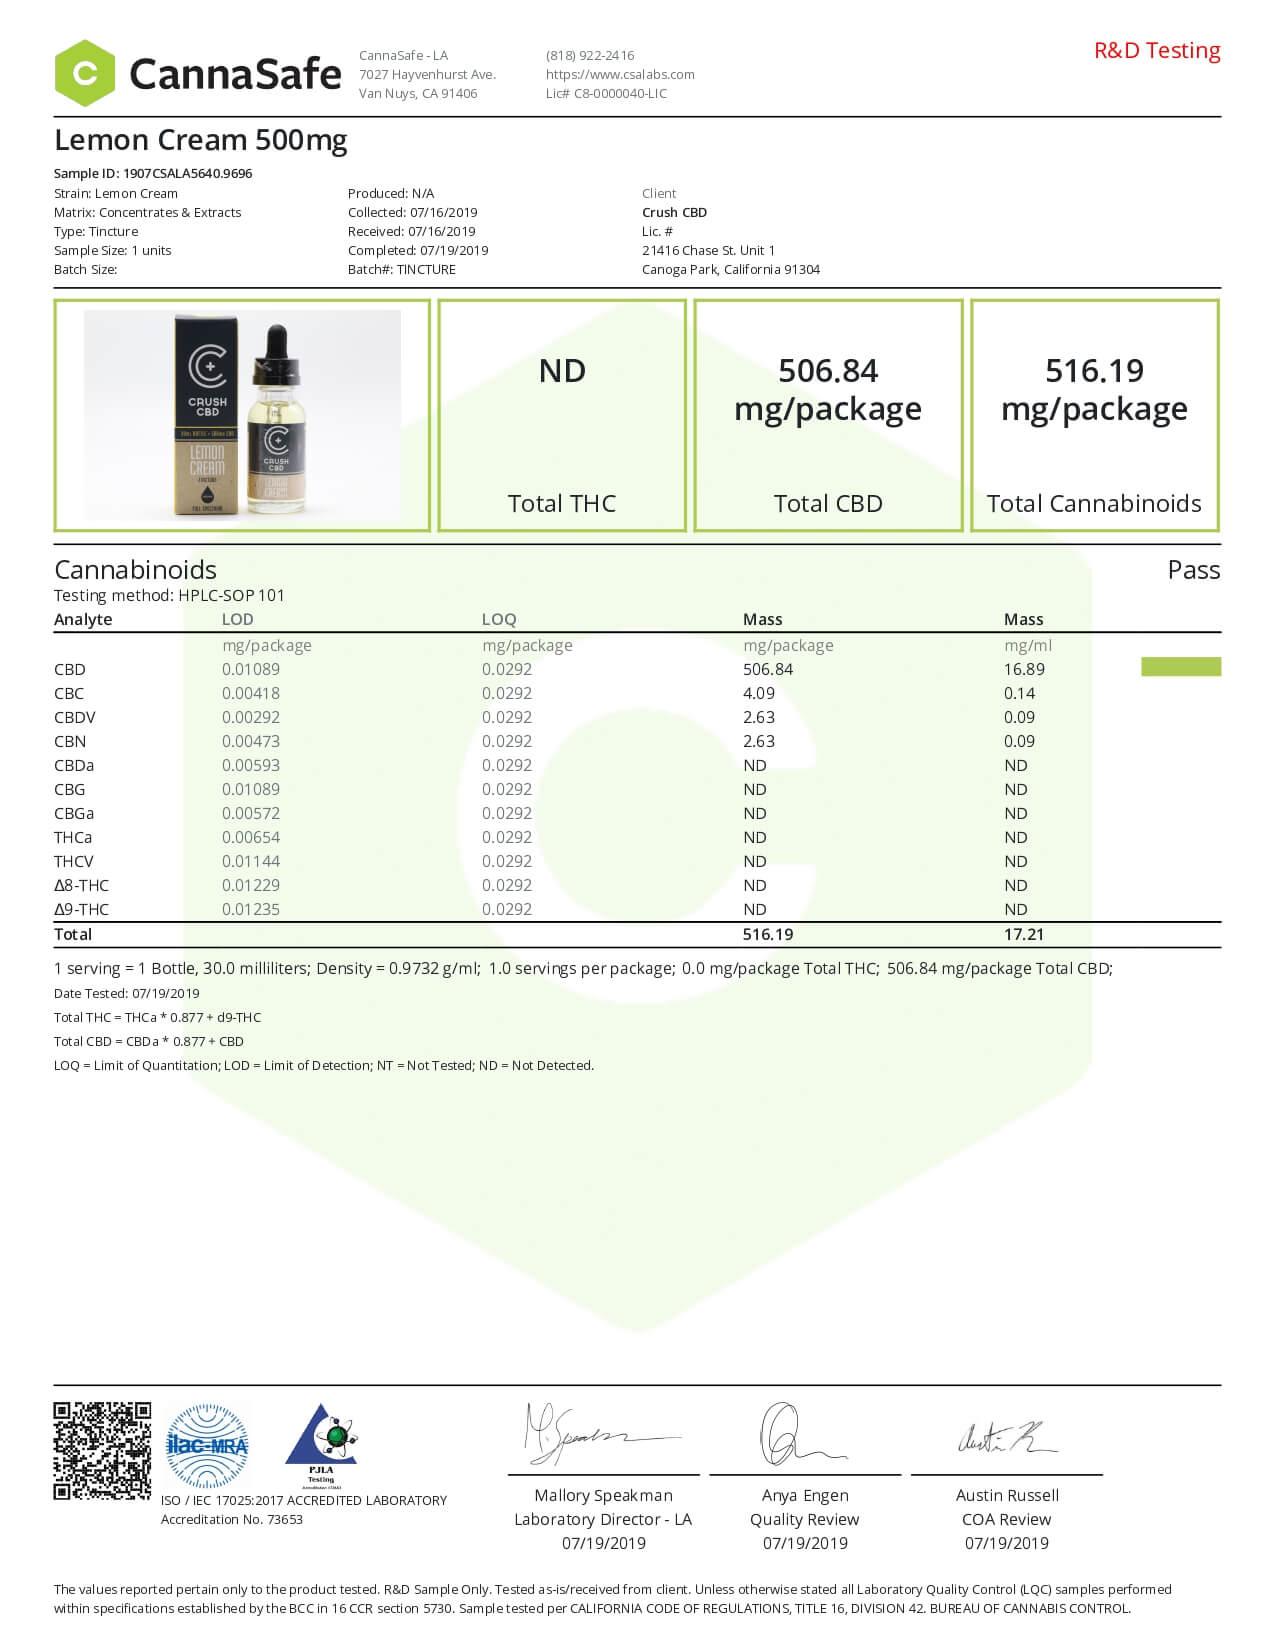 Crush CBD Tincture Lemon Cream 500mg Lab Report